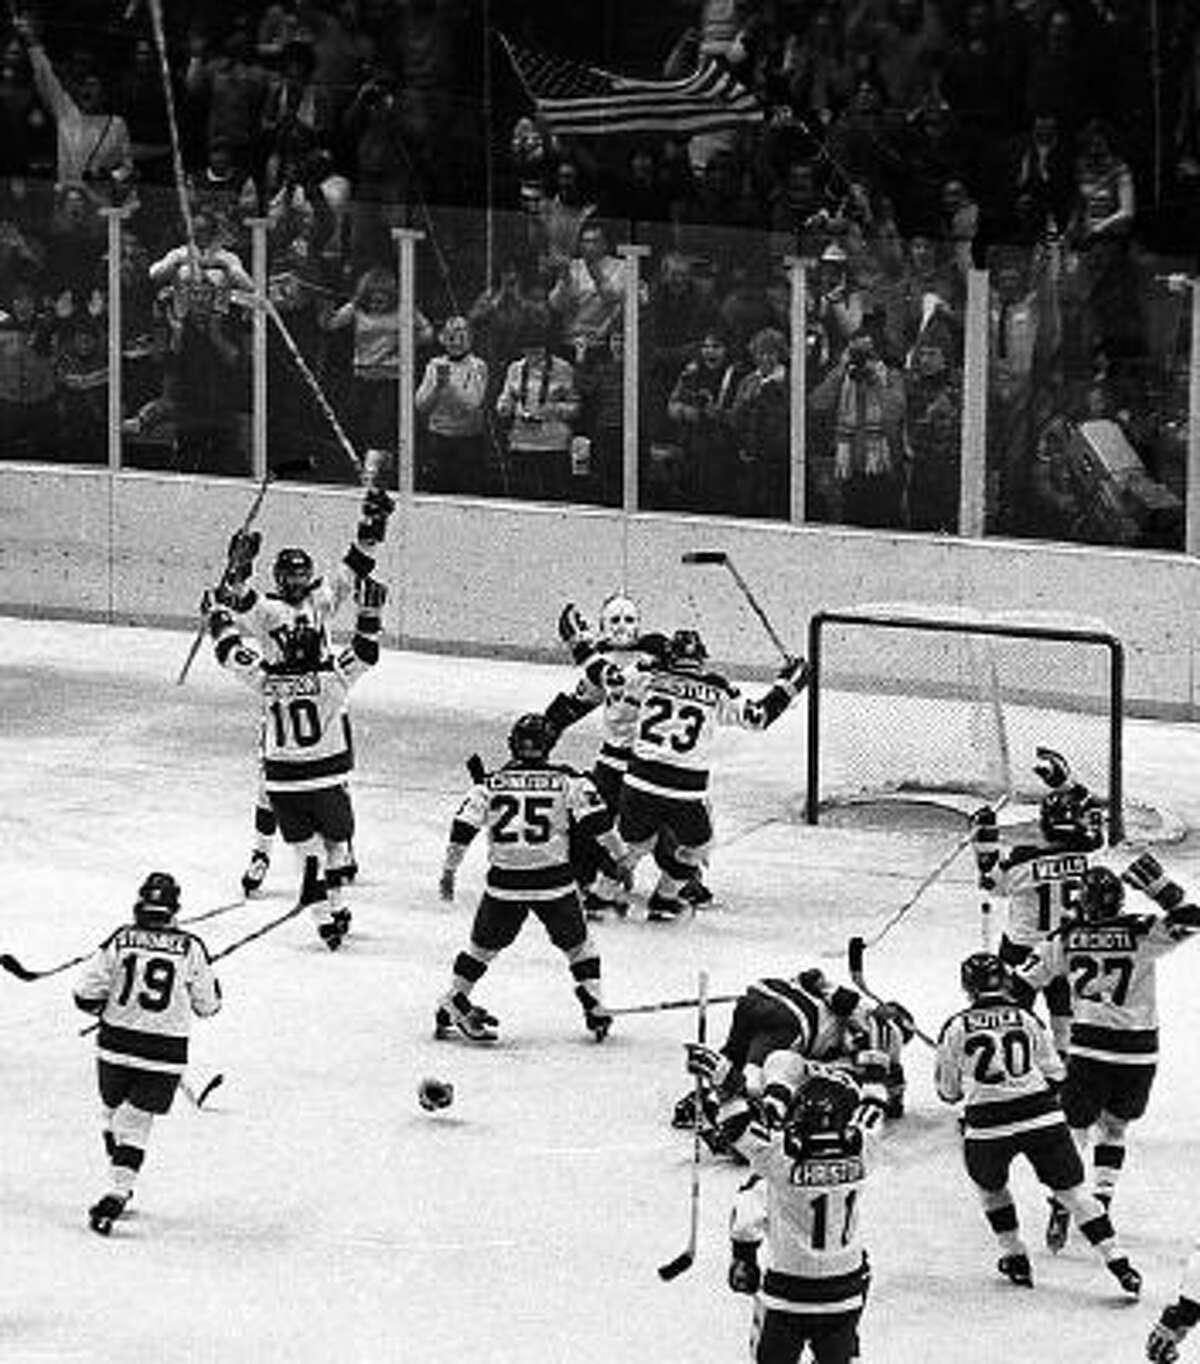 The U.S. men's ice hockey team celebrates winning beating the Soviet Union in the